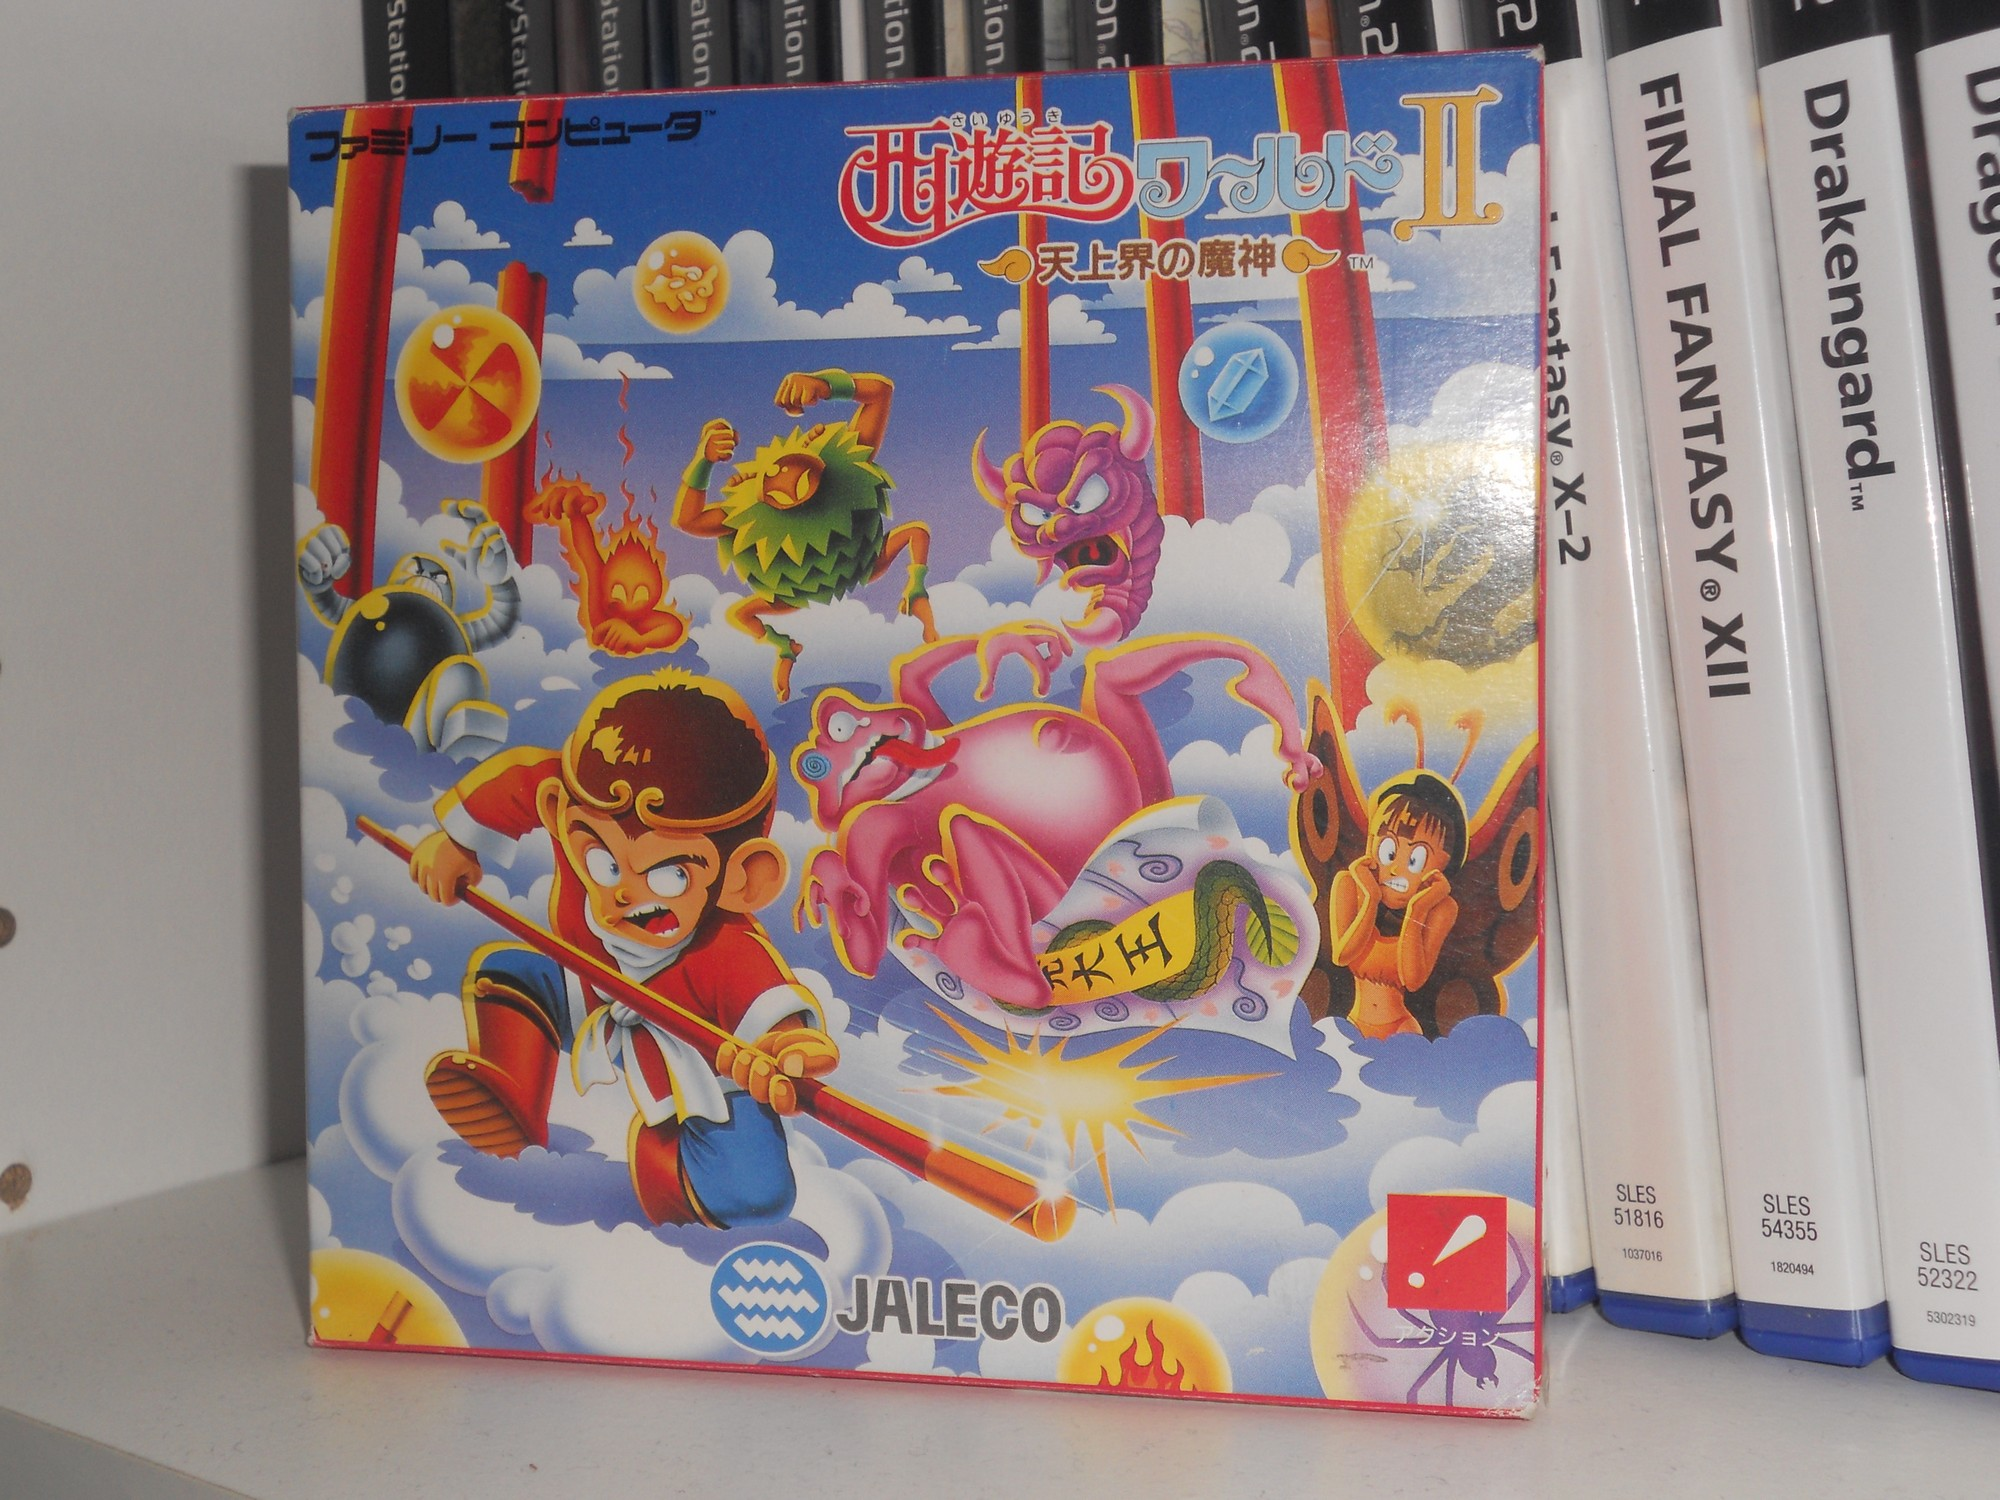 NINTENDO NES + Famicom + Disk System - Page 4 VvOddW